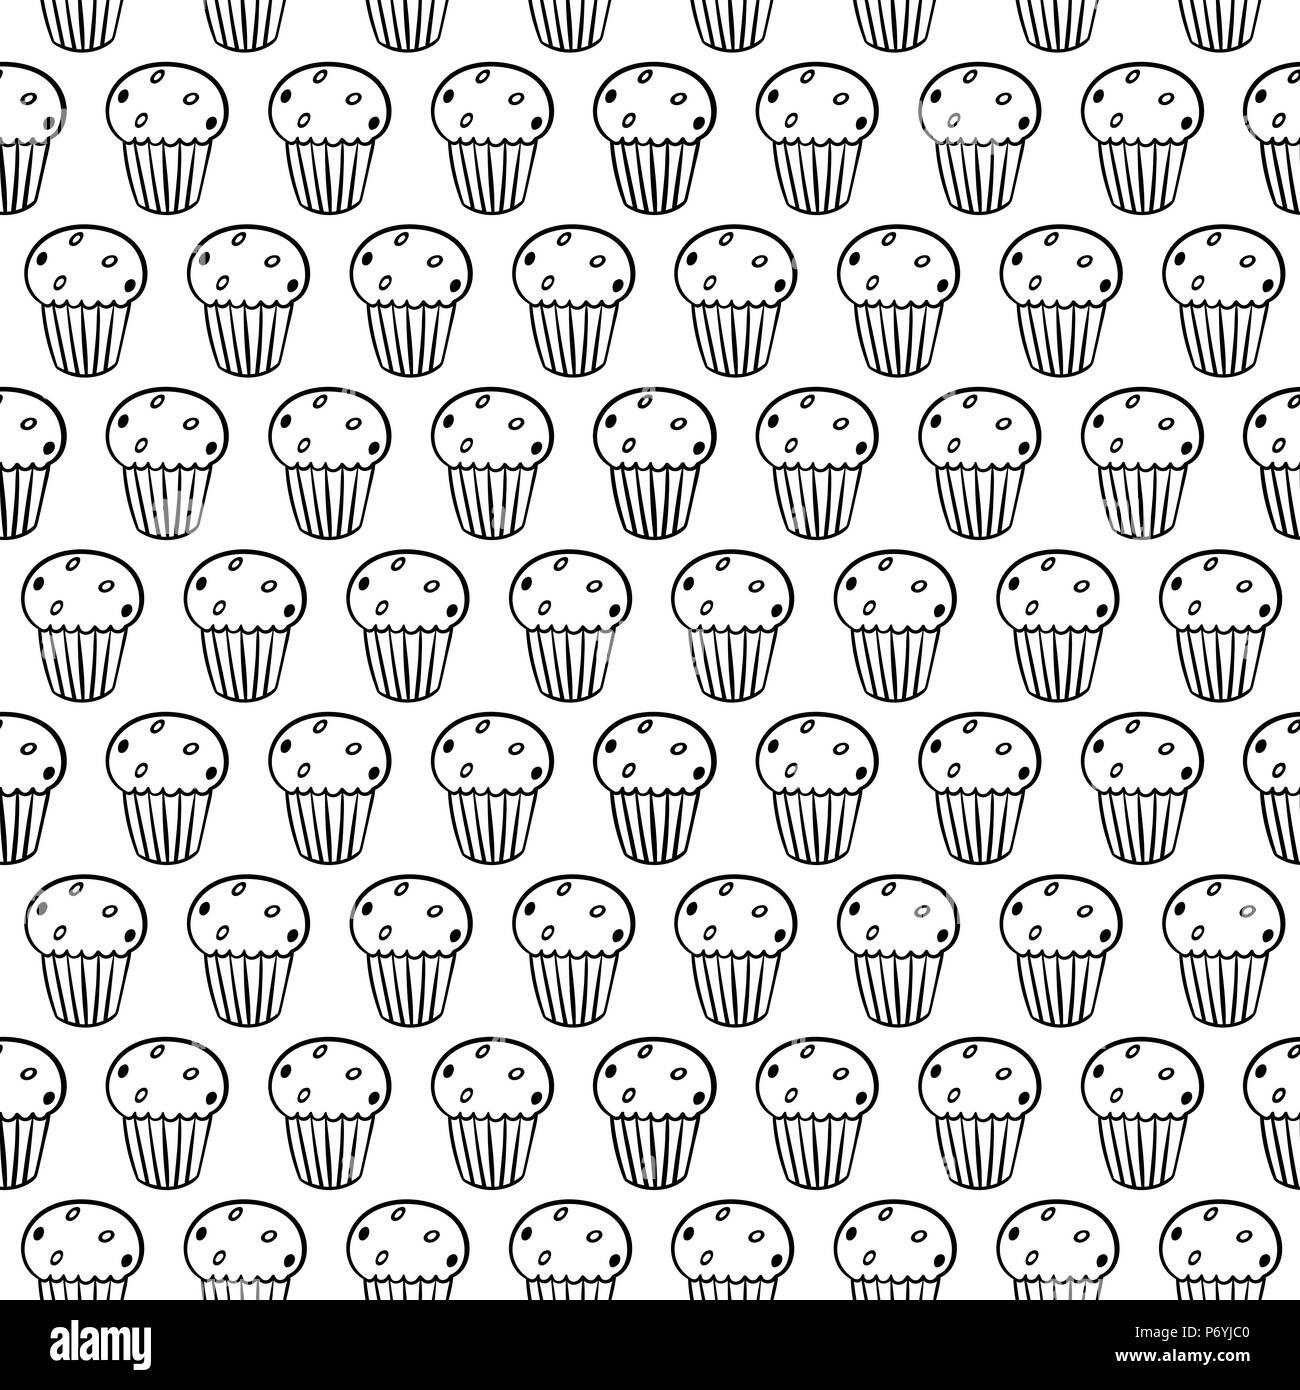 Cupcakes Cute Dibujos Animados Sobre Fondo Blanco Sencillo